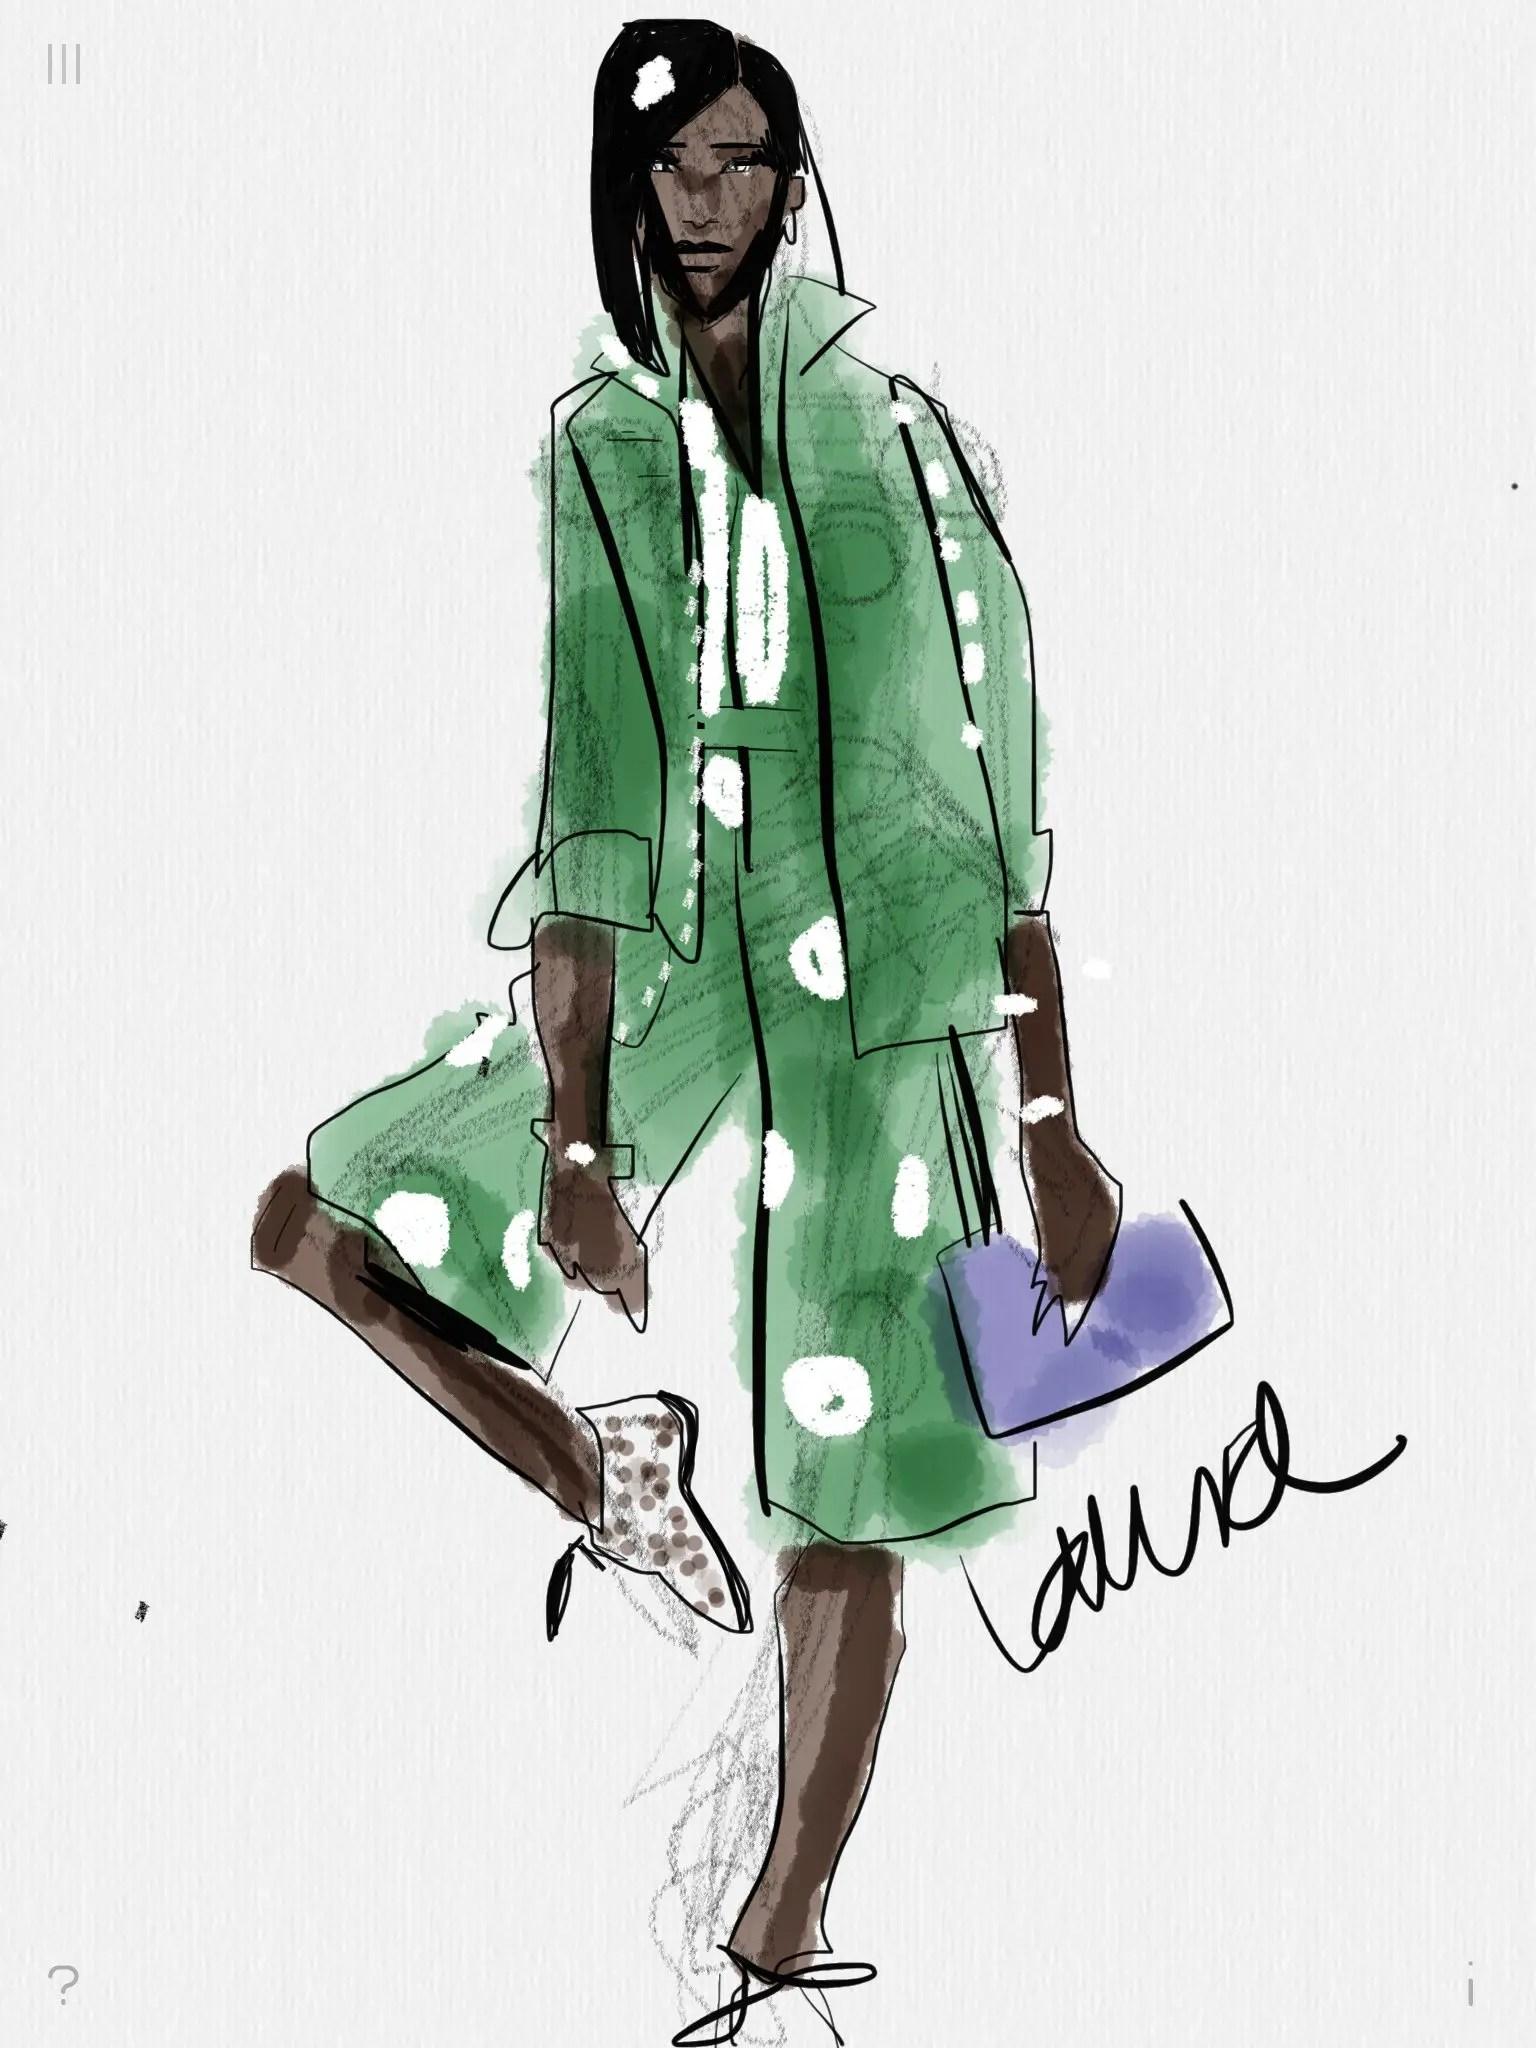 Digital Fashion Sketching With Tayasui Sketches App On Ipad